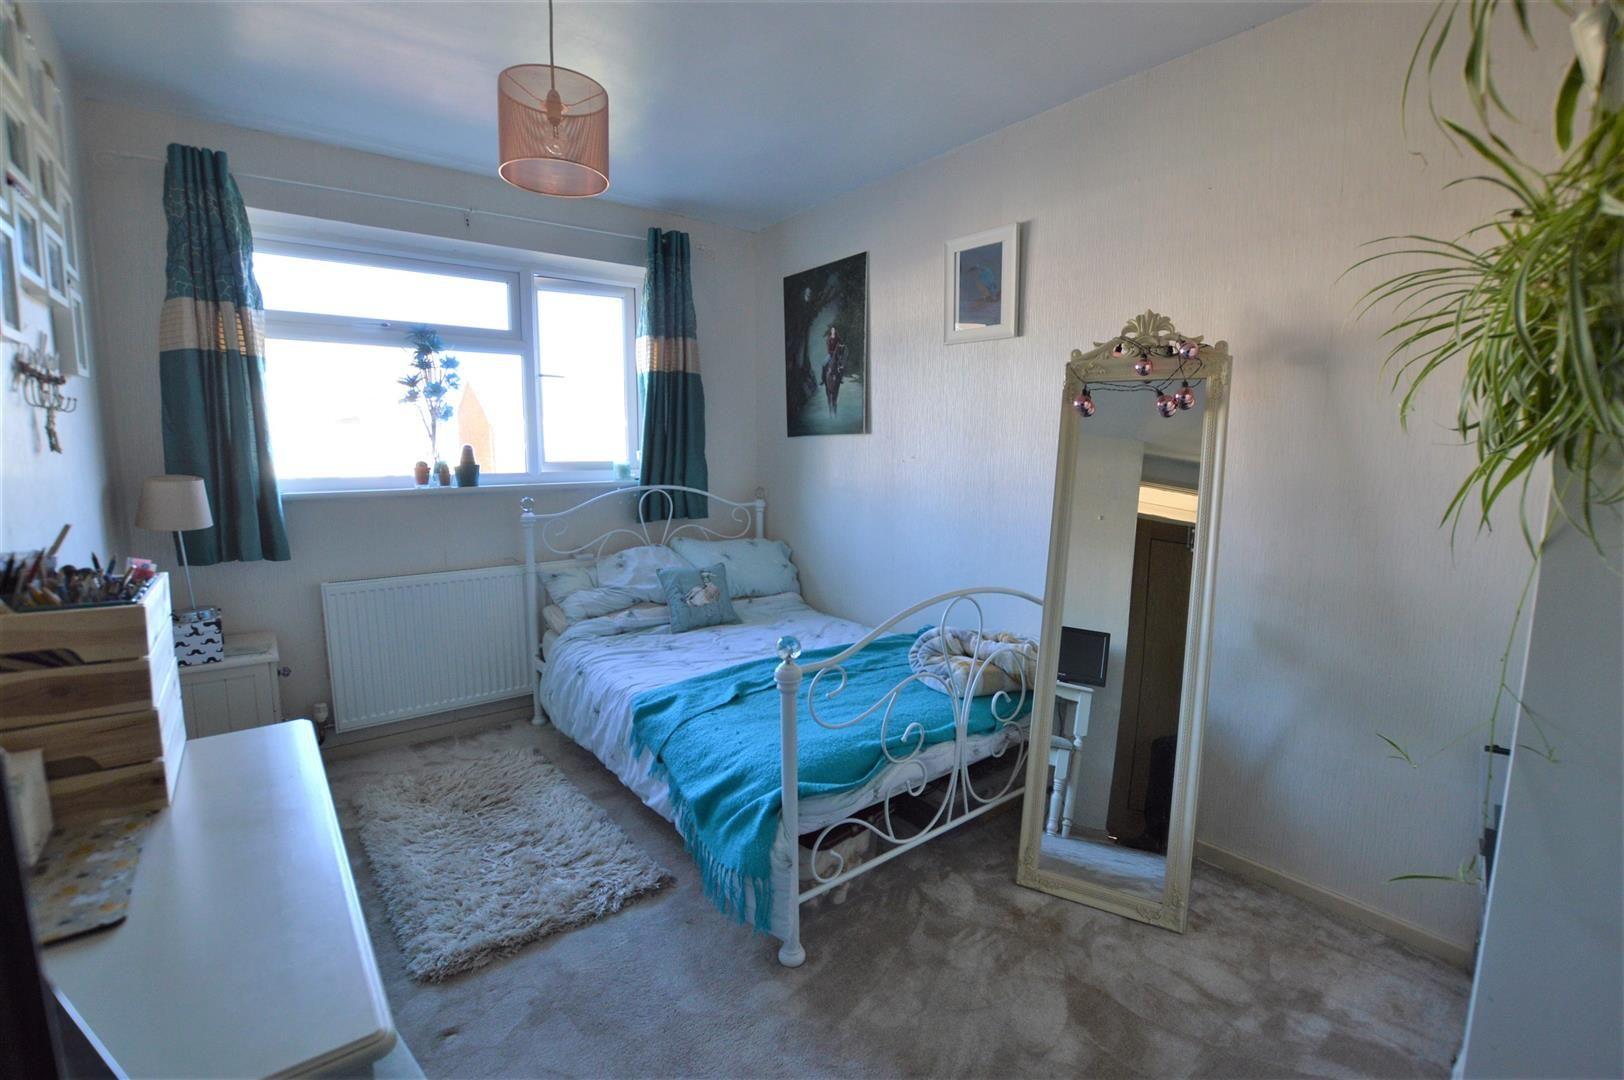 4 bed semi-detached for sale in Bromyard  - Property Image 7